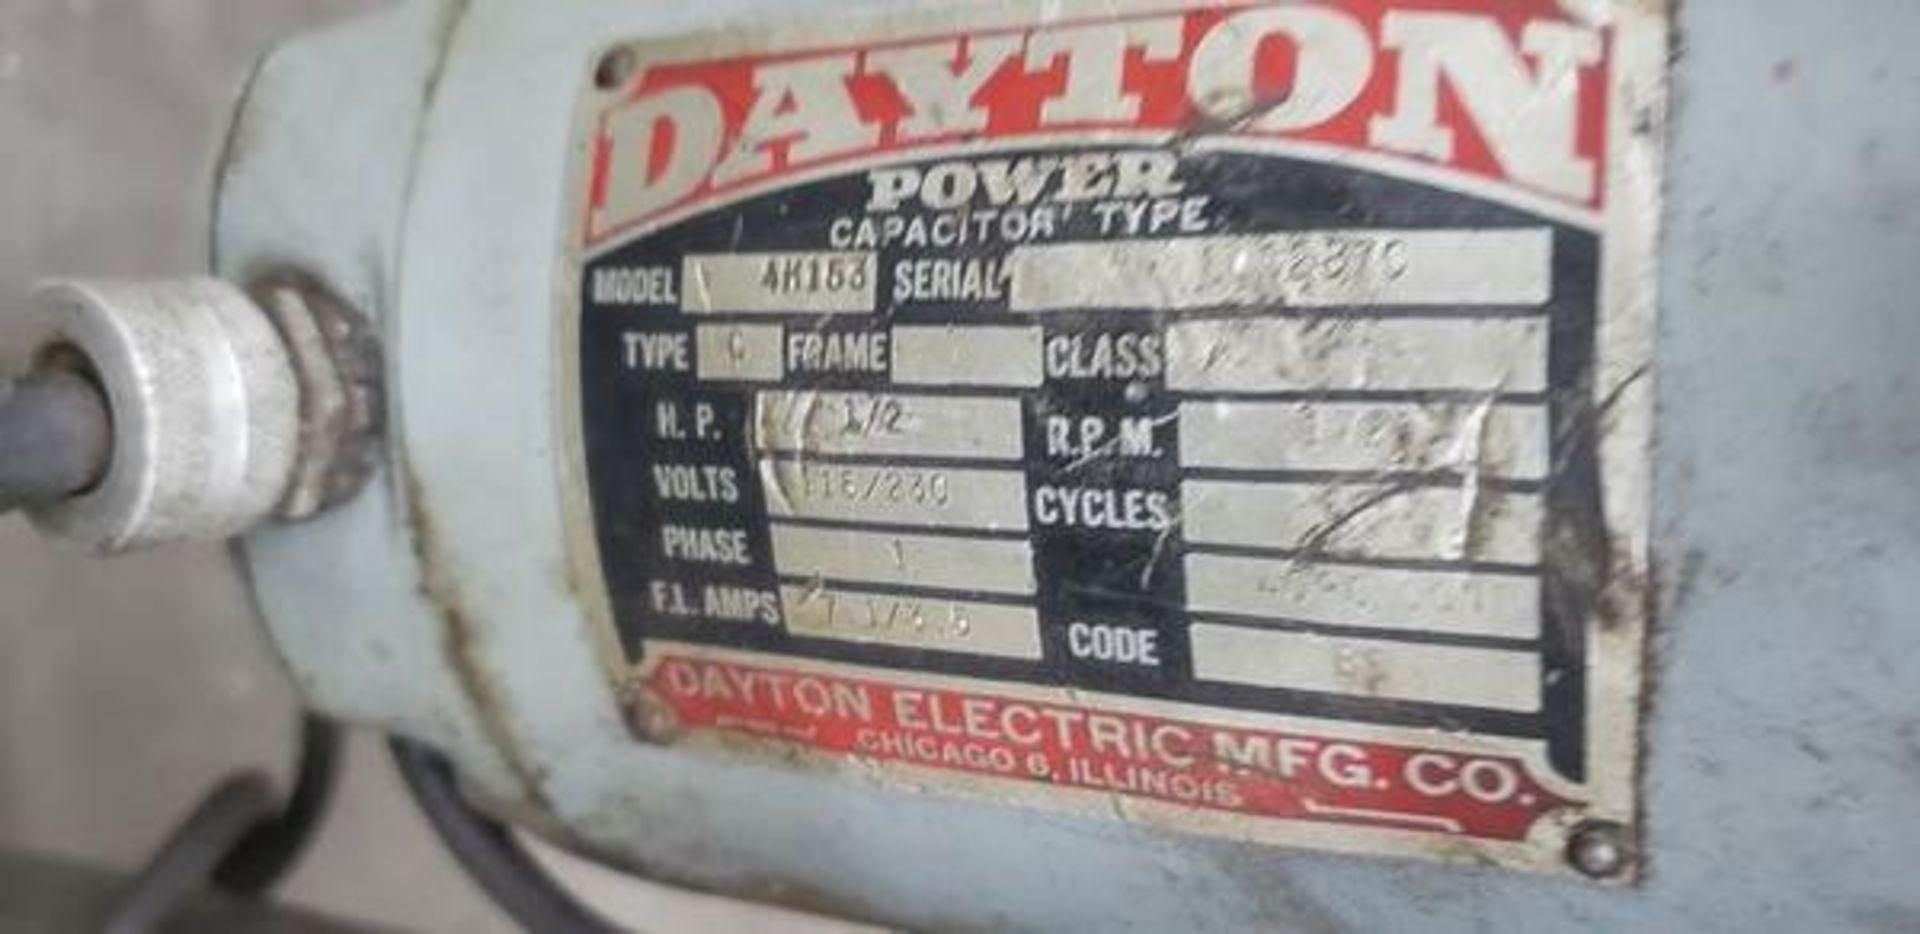 DAYTON 4K153 DRILL PRESS - Image 5 of 6